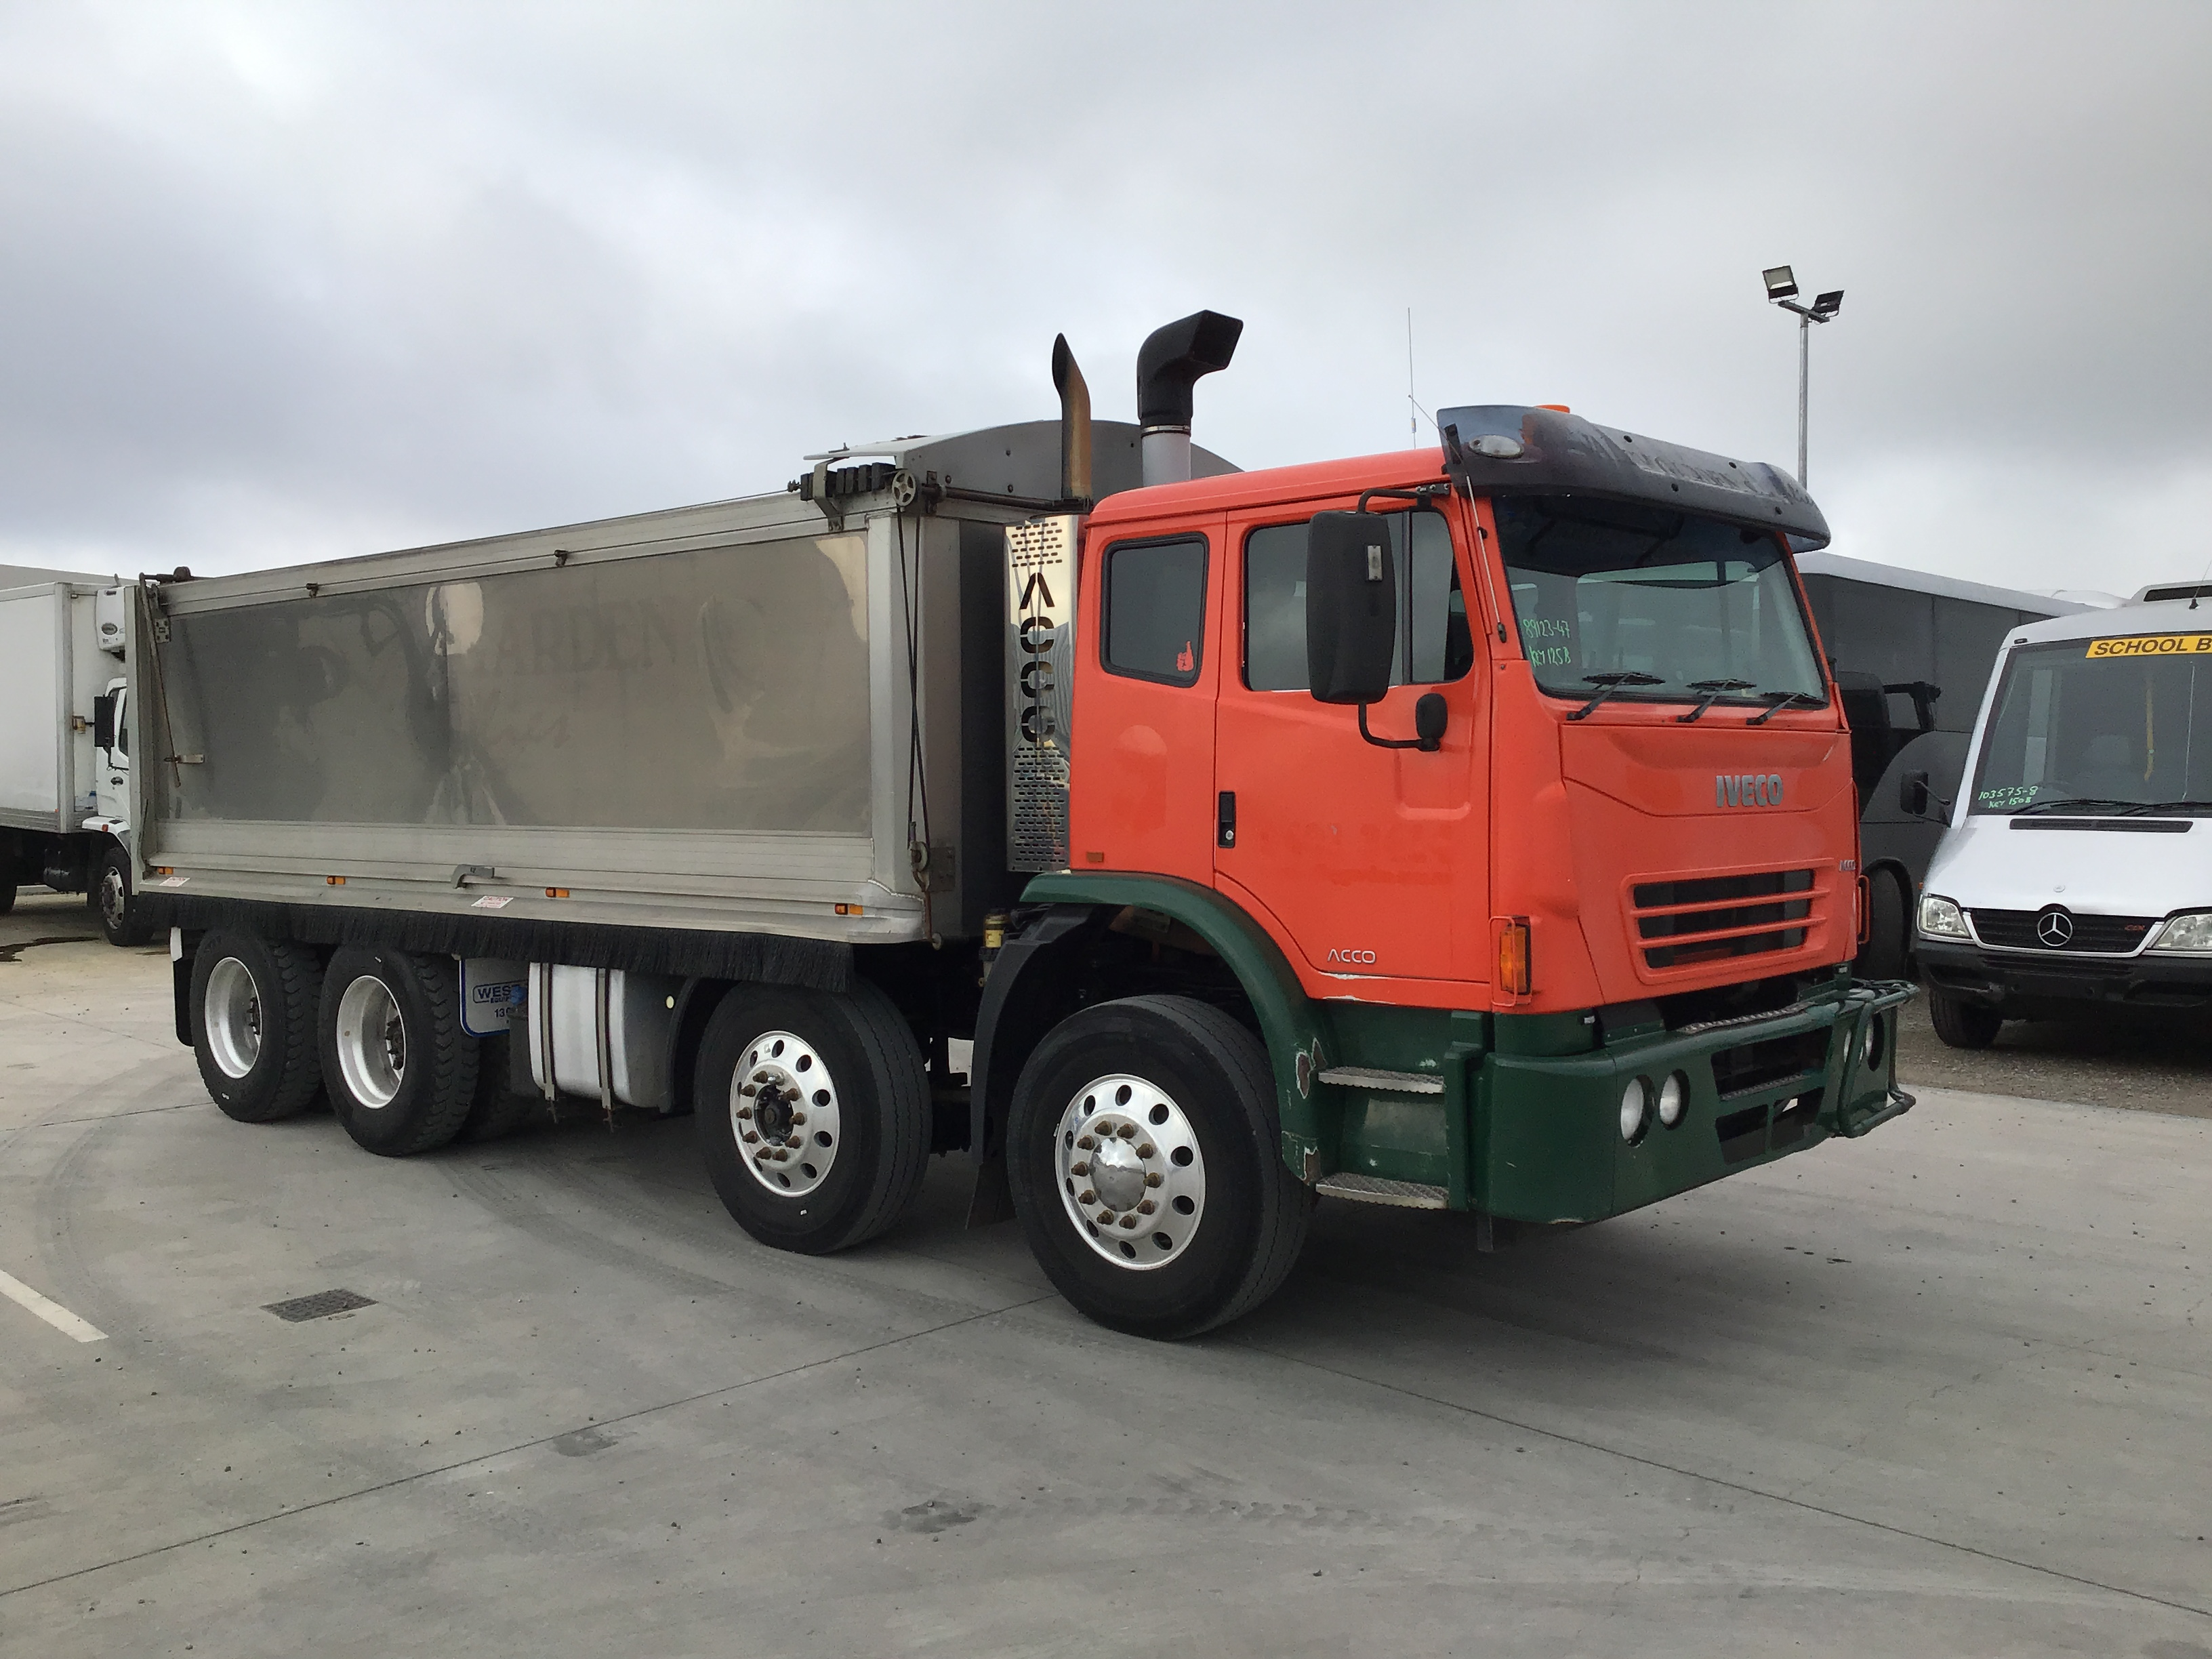 2013 Iveco Acco 8 x 4 Tipper Truck